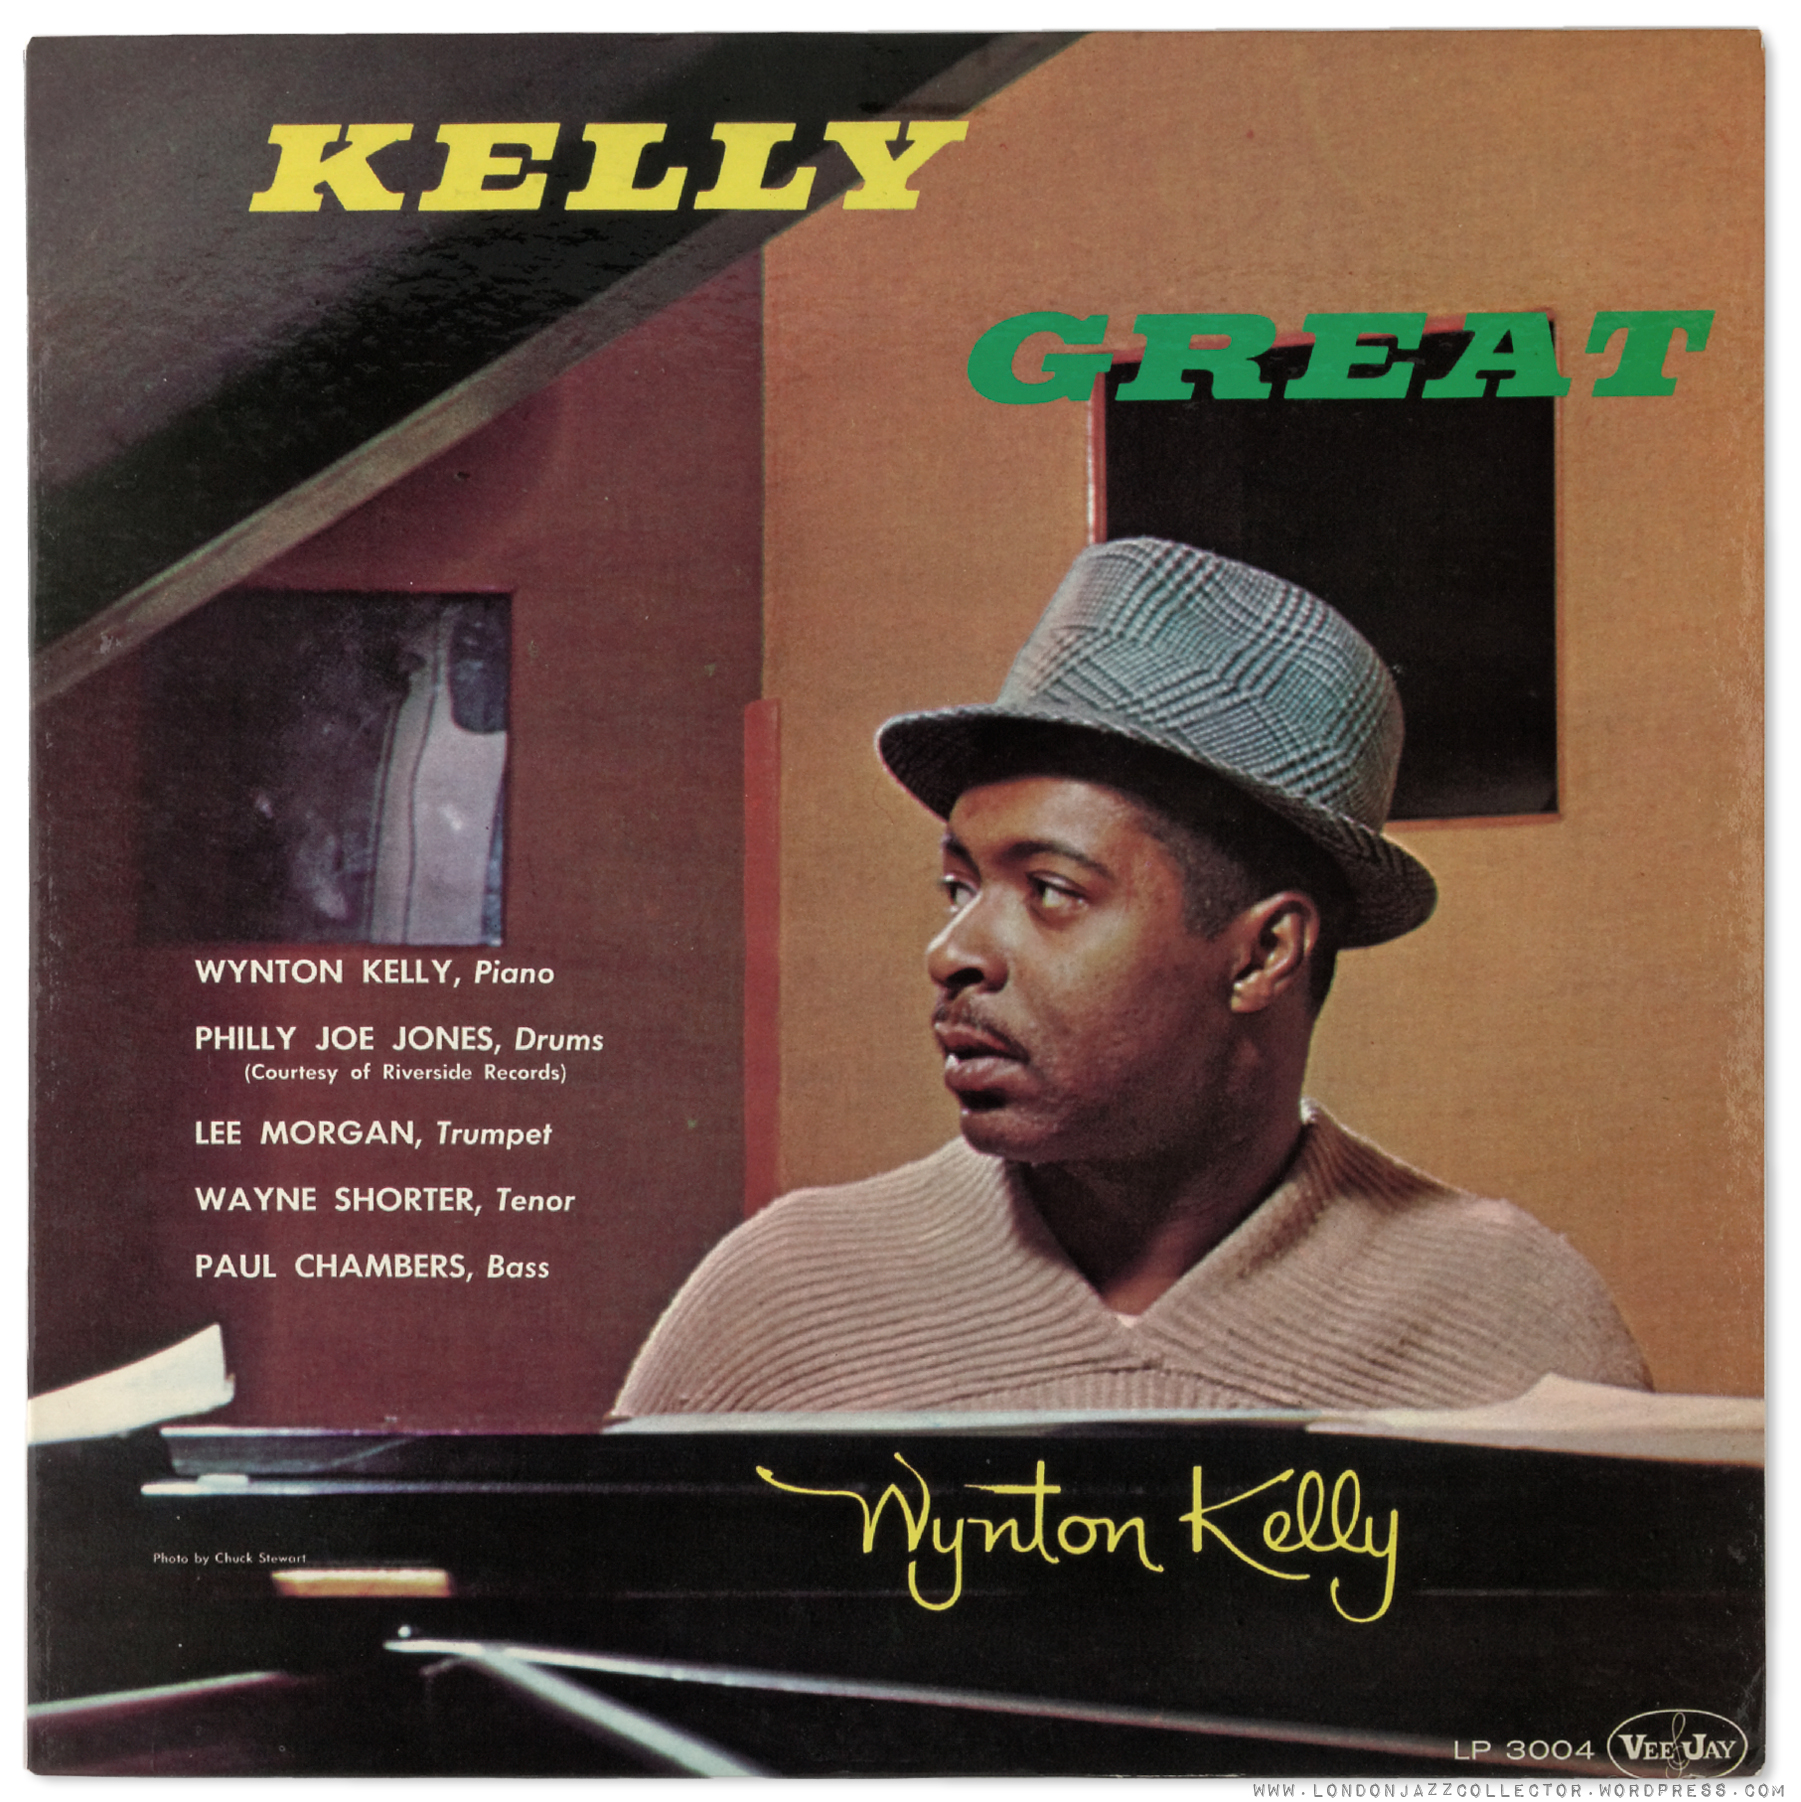 wynton-kelly-kelly-great-vee-jay-cv-1800